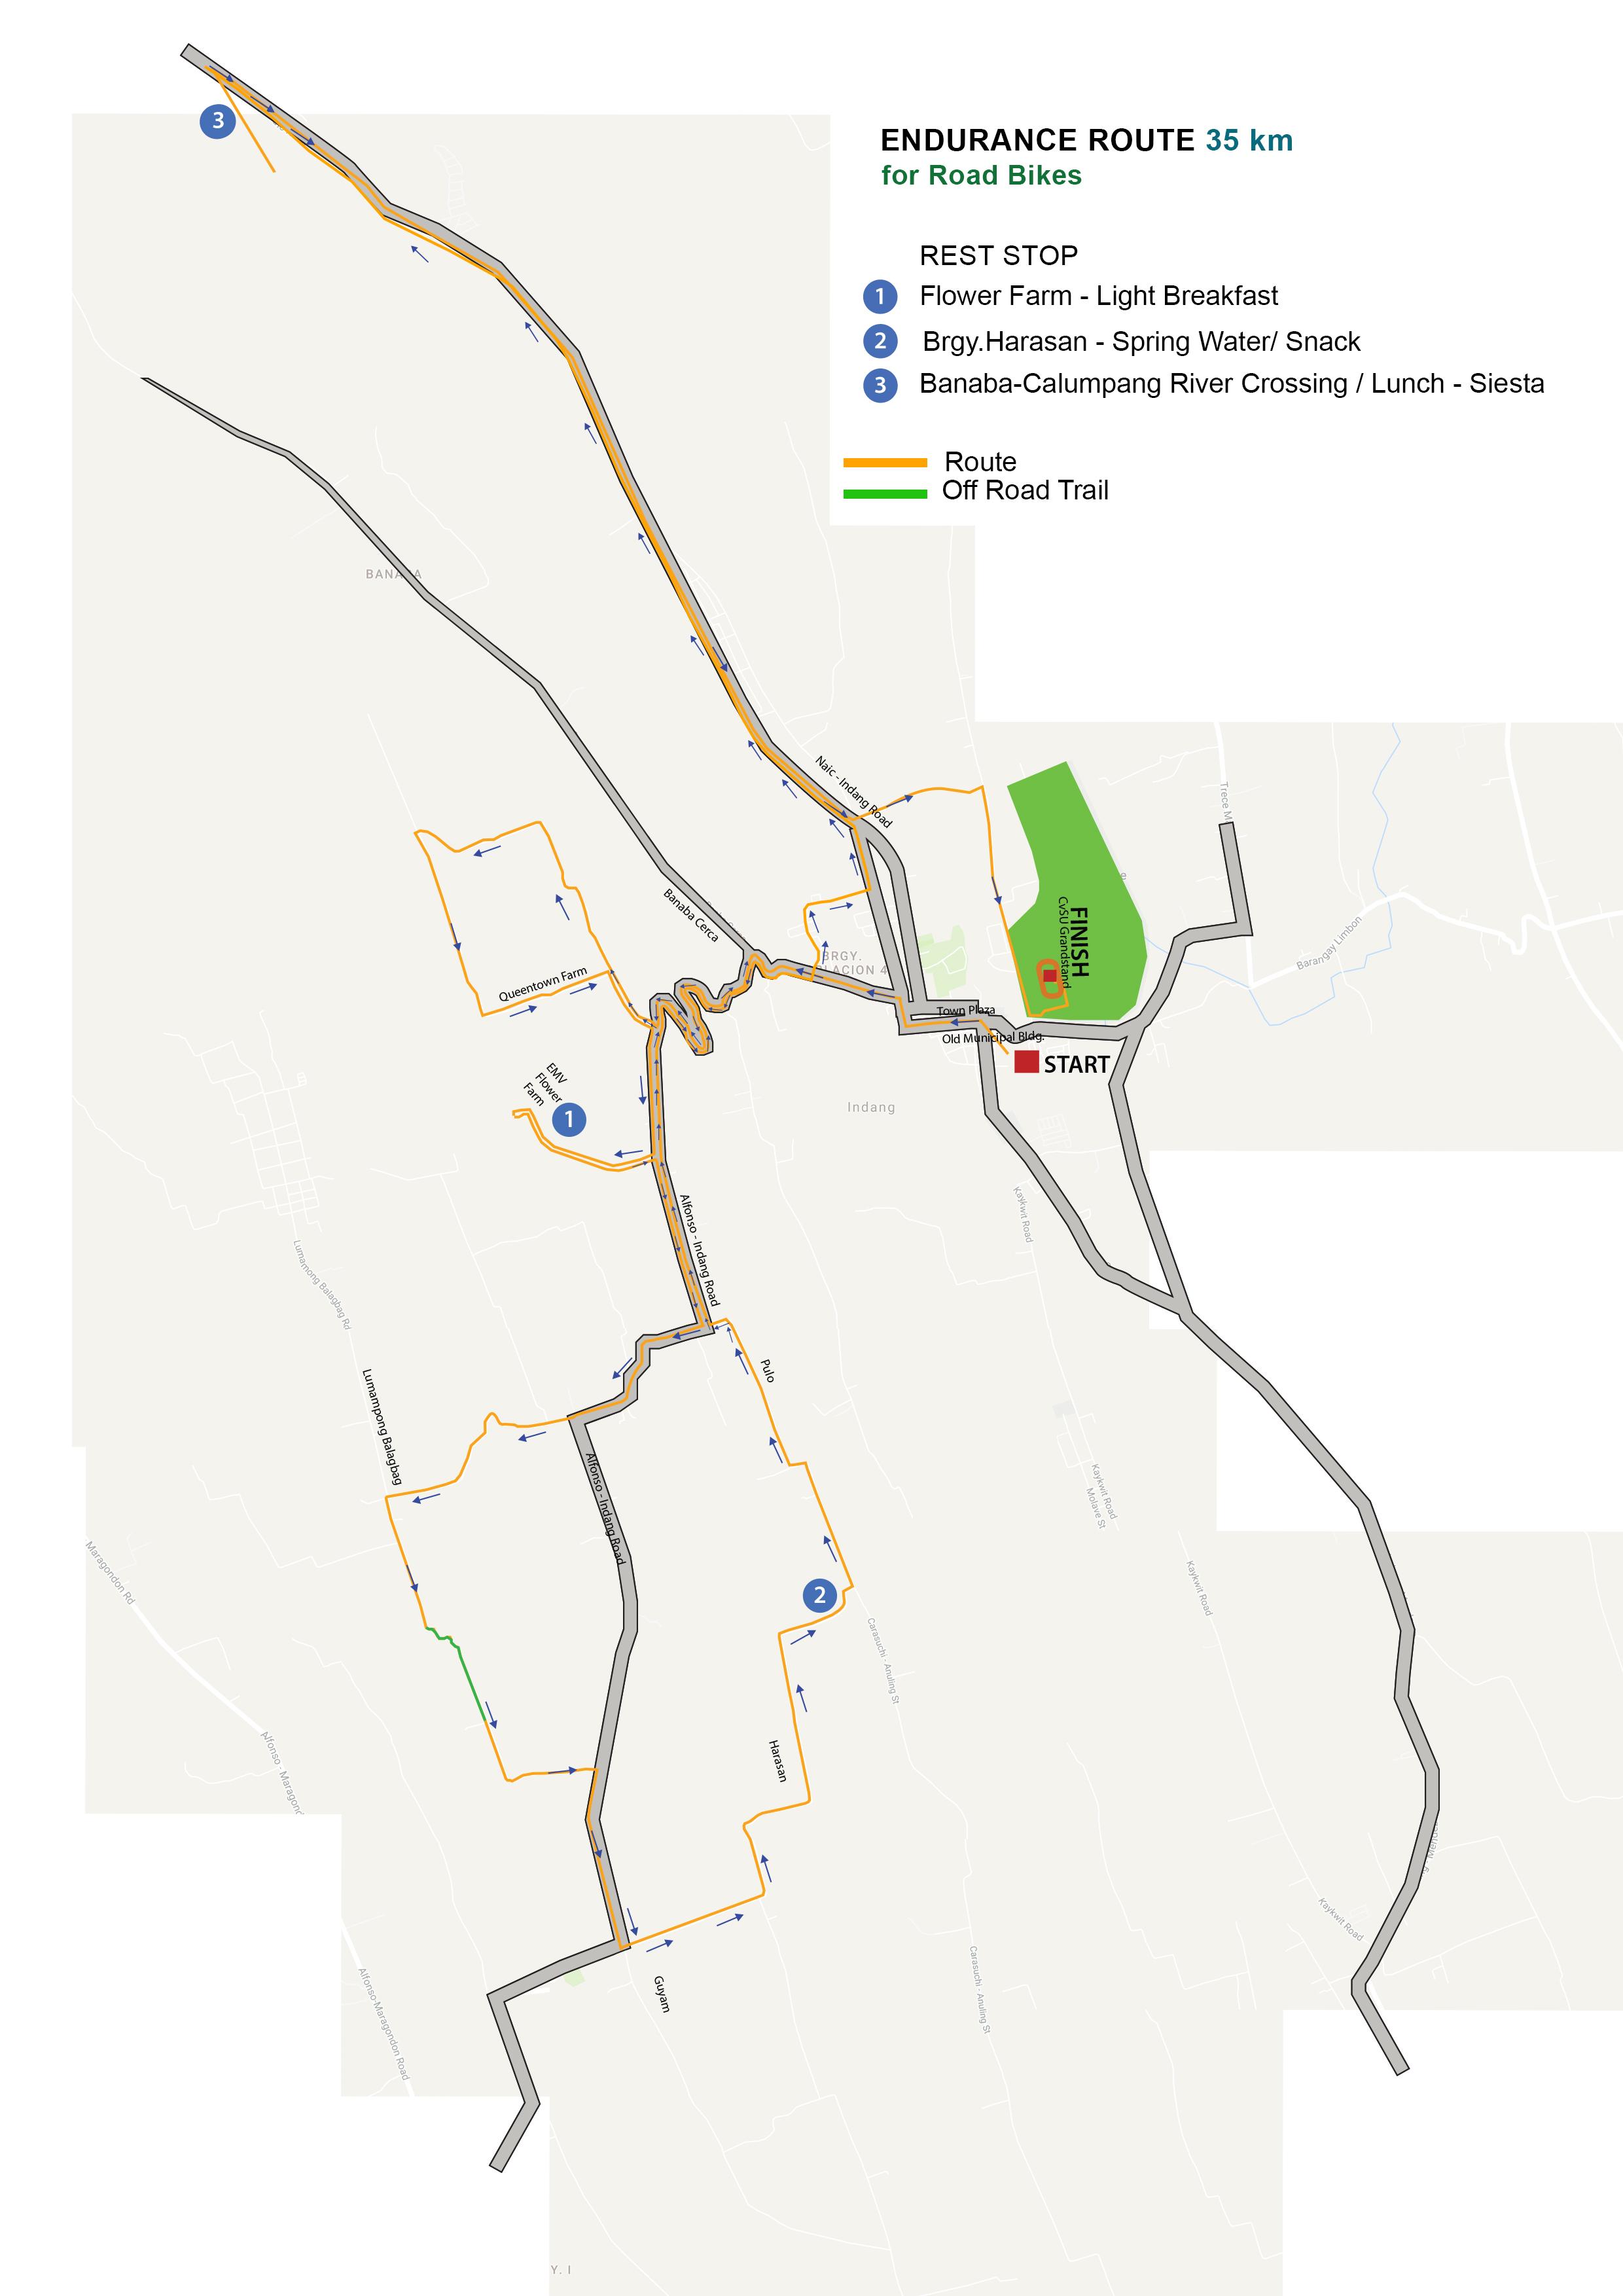 RoadBike Route